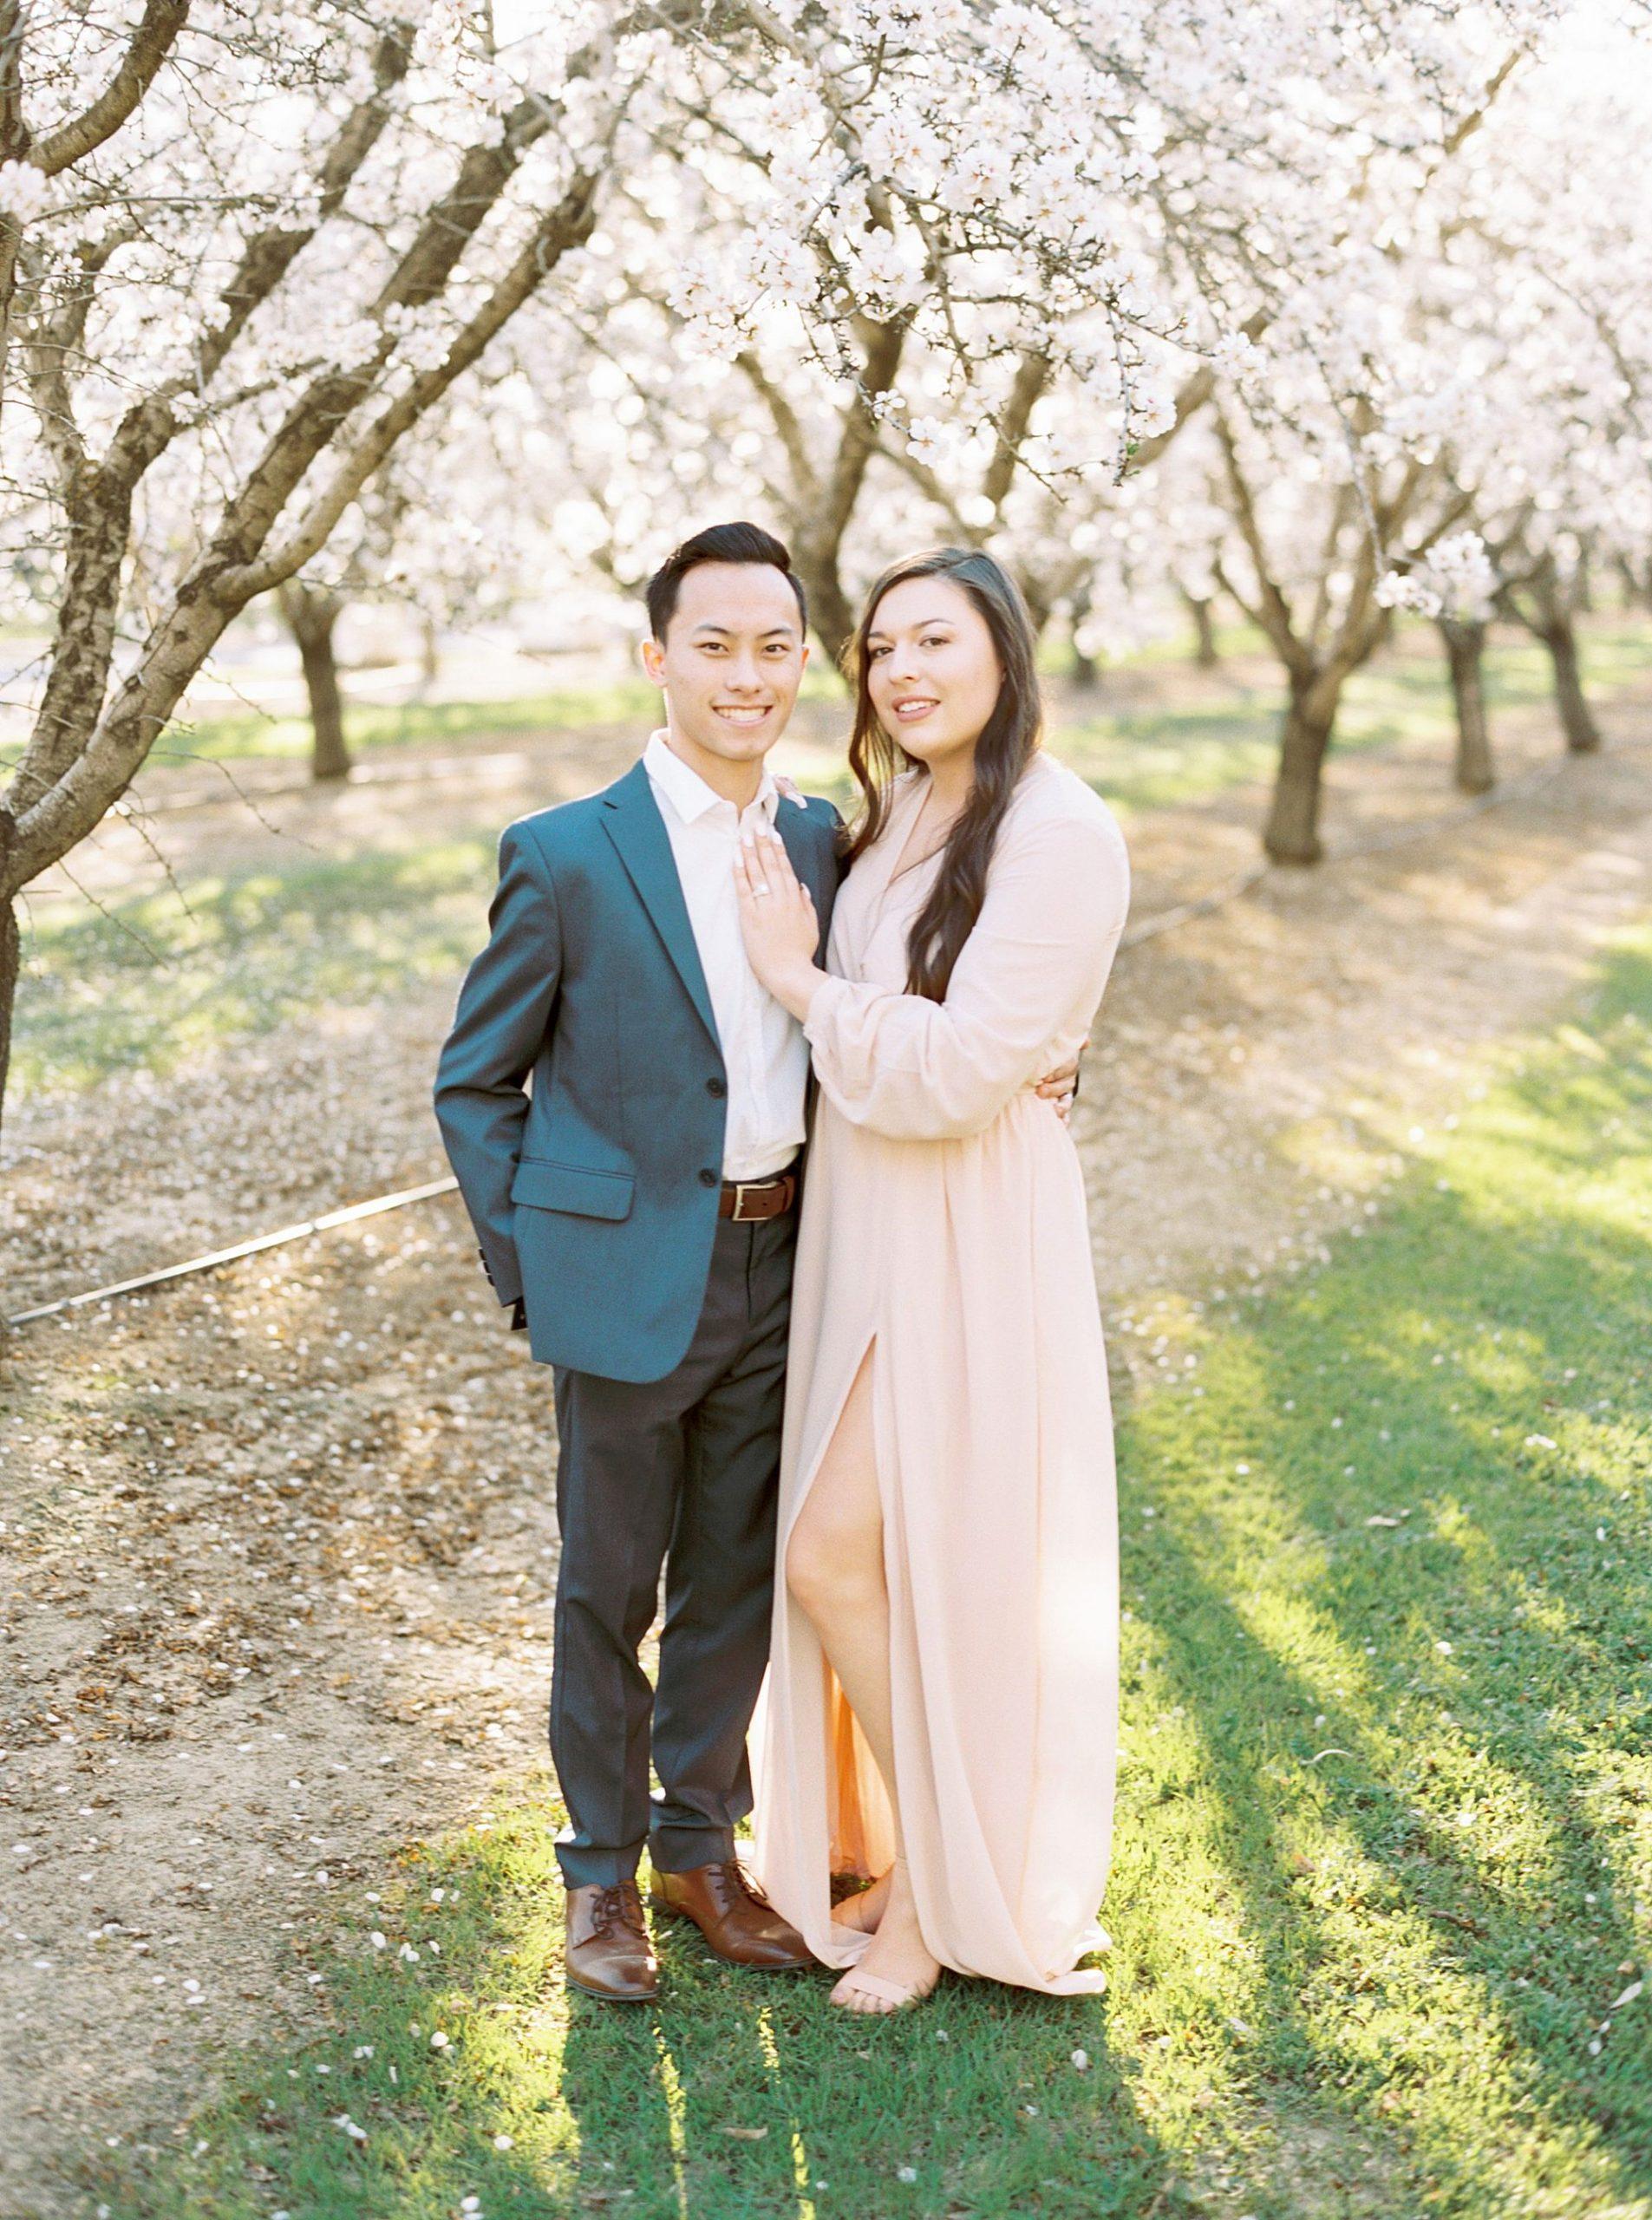 Almond Orchard Engagement Session - Caley and Tyler - Lone Oak Wedding - Ashley Baumgartner - Almond Blossom_0006.jpg